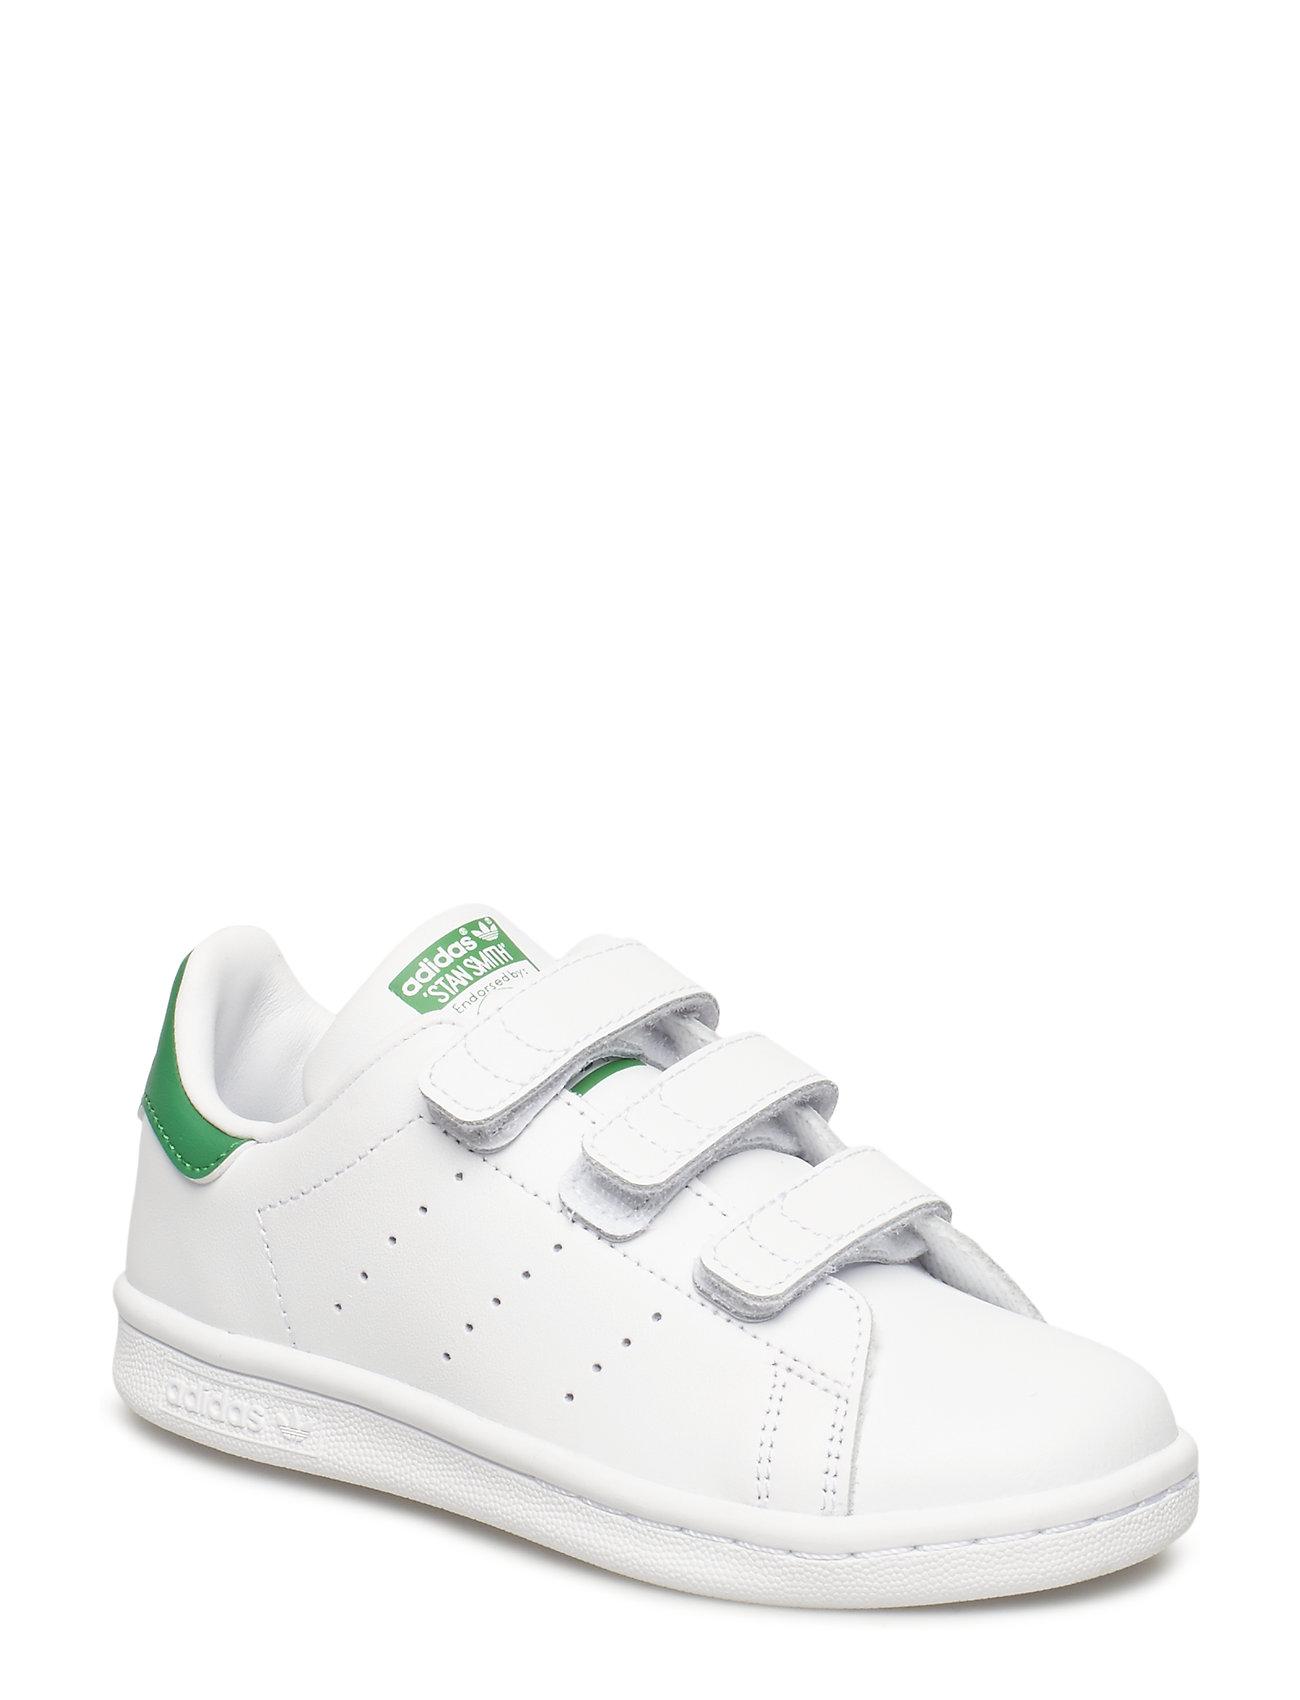 adidas Originals STAN SMITH CF C - FTWWHT/FTWWHT/GREEN